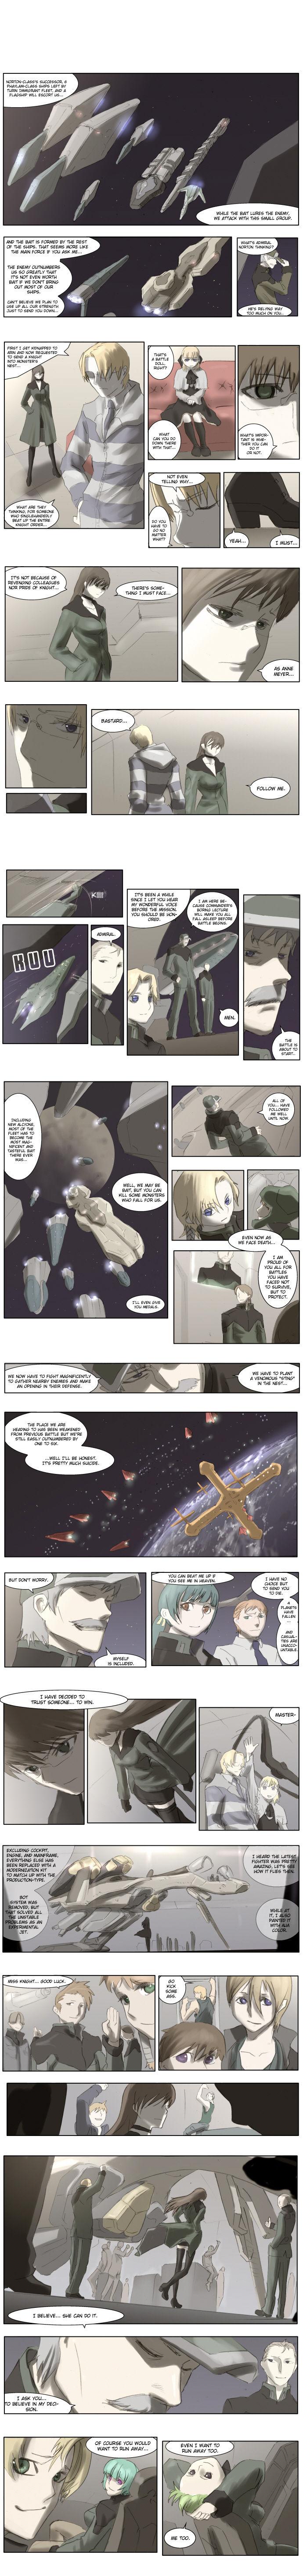 Knight Run 39 Page 2